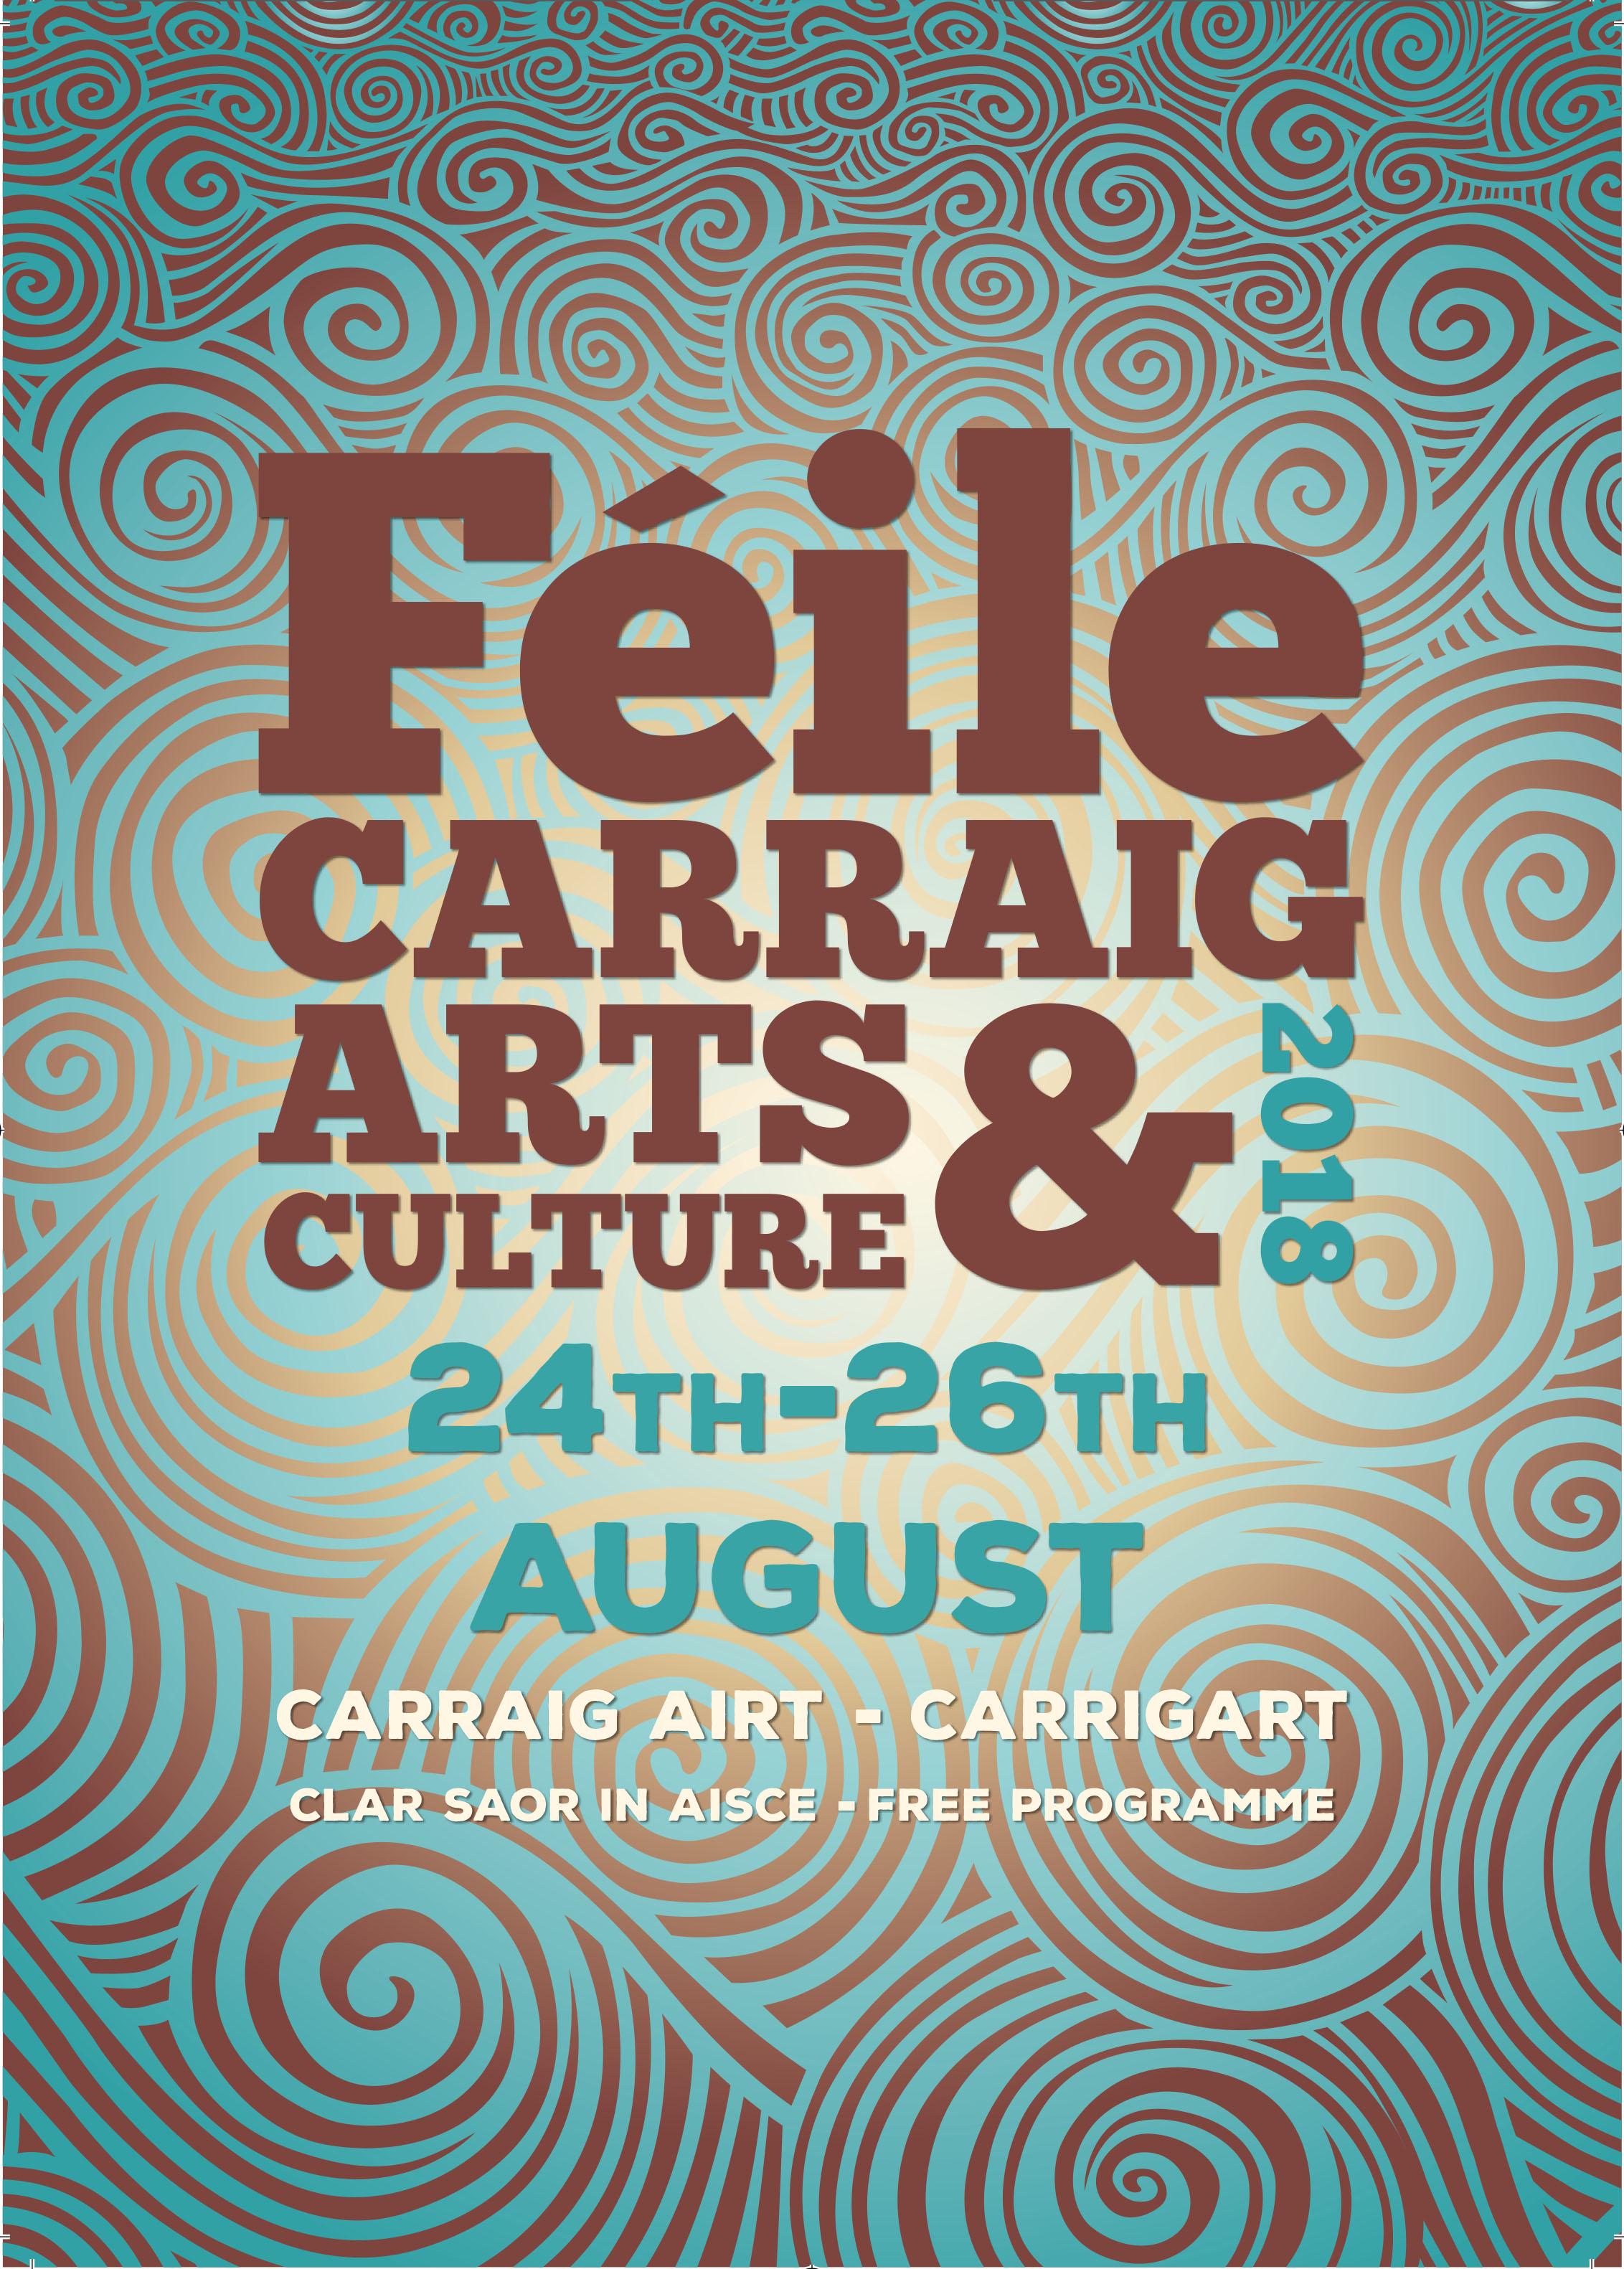 Carraig Airt Festival 2018 Programme